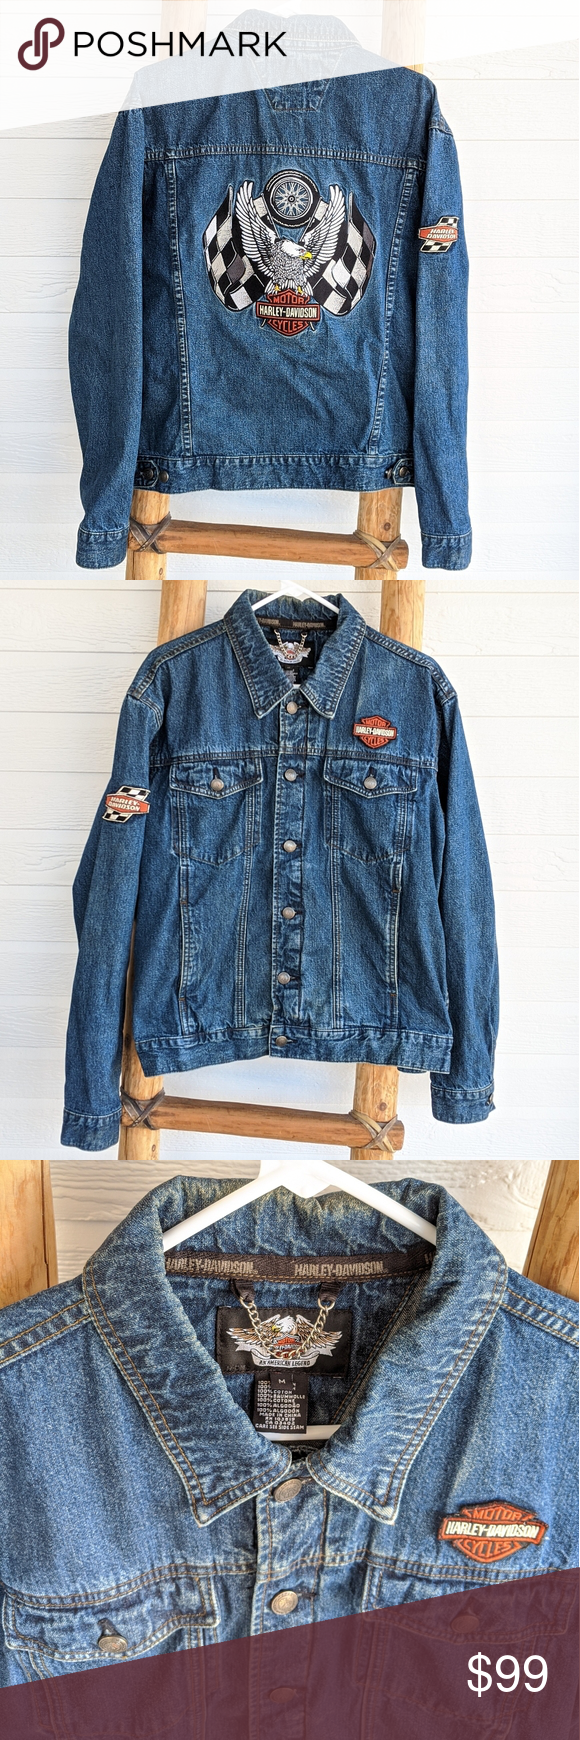 Harley Davidson Denim Jean Jacket Womens Size M Jean Jacket Women Jackets For Women Denim Jean Jacket [ 1740 x 580 Pixel ]